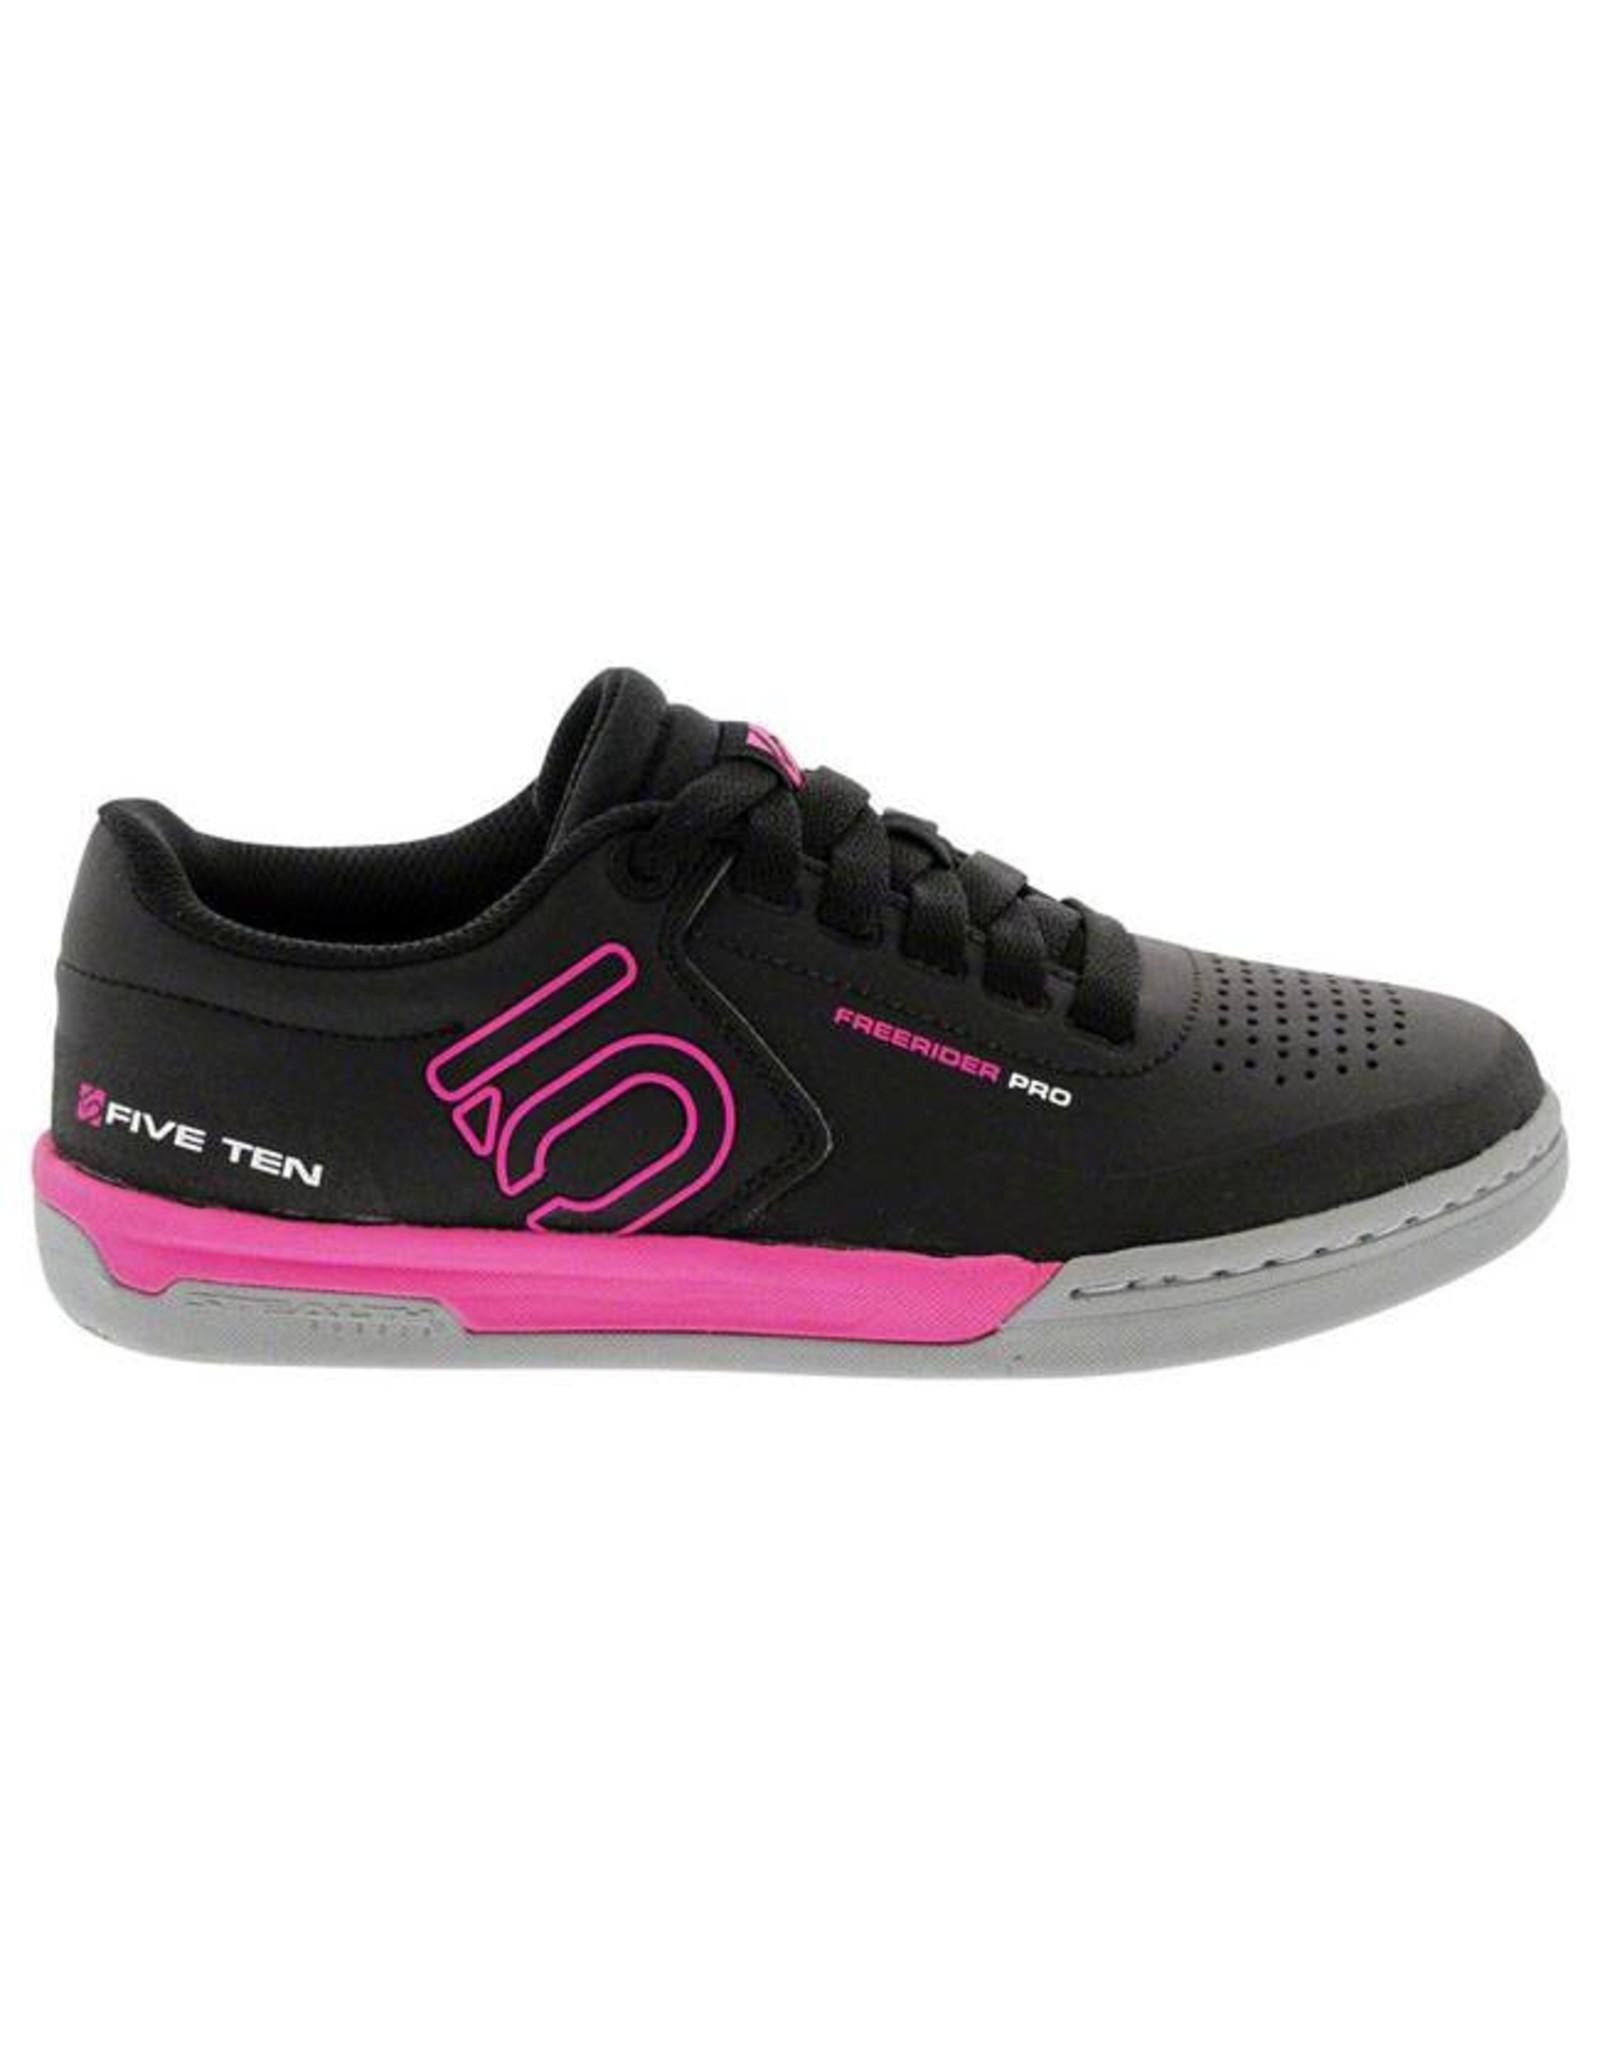 Five Ten Five Ten Freerider Pro Women's Flat Pedal Shoe Black/Pink 10.5